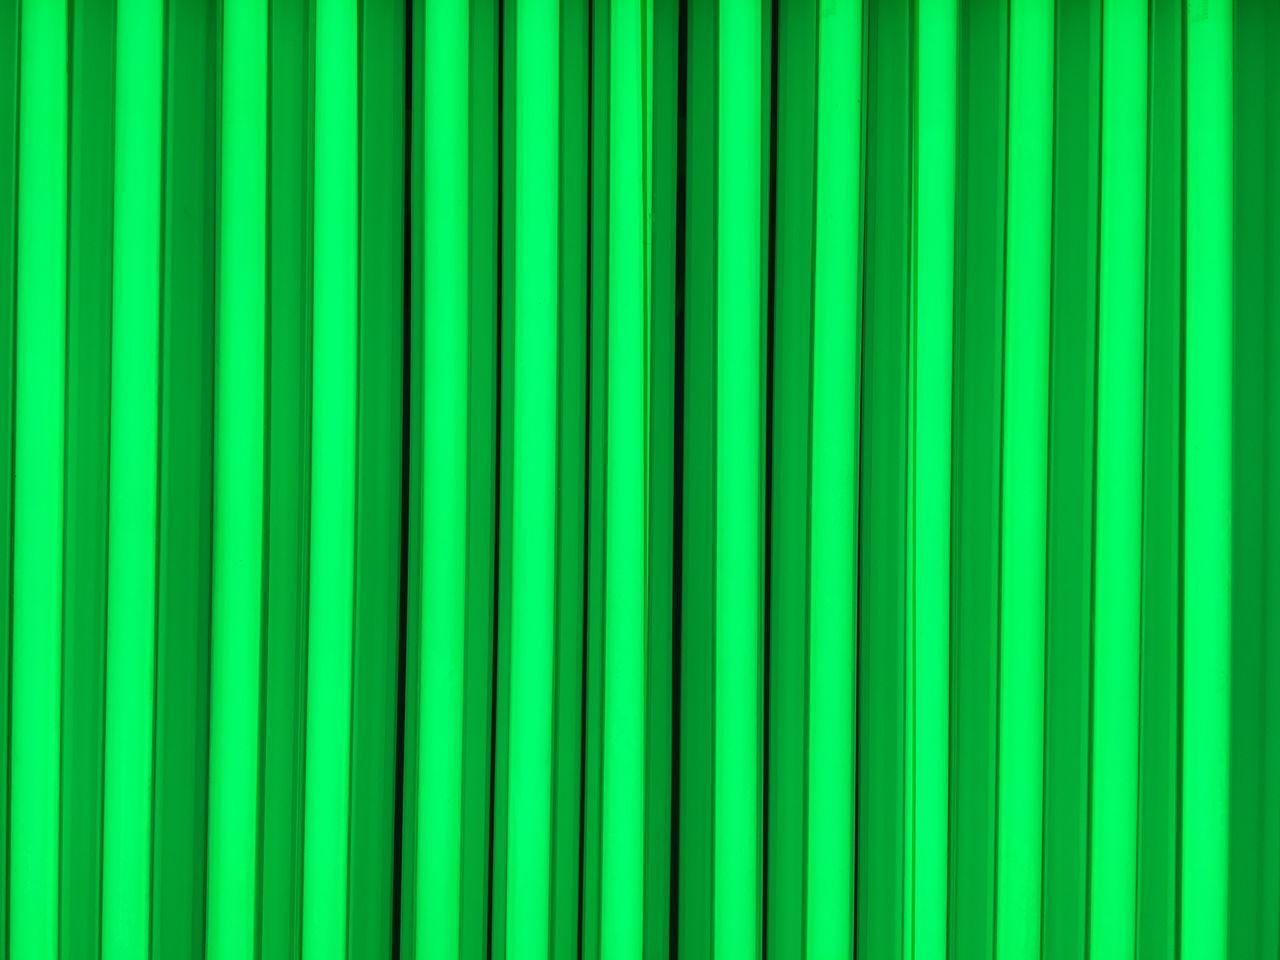 Green Color Green Light Lightbulb Lamp Colors Wallpaper Pattern Vibrant Color Abstract